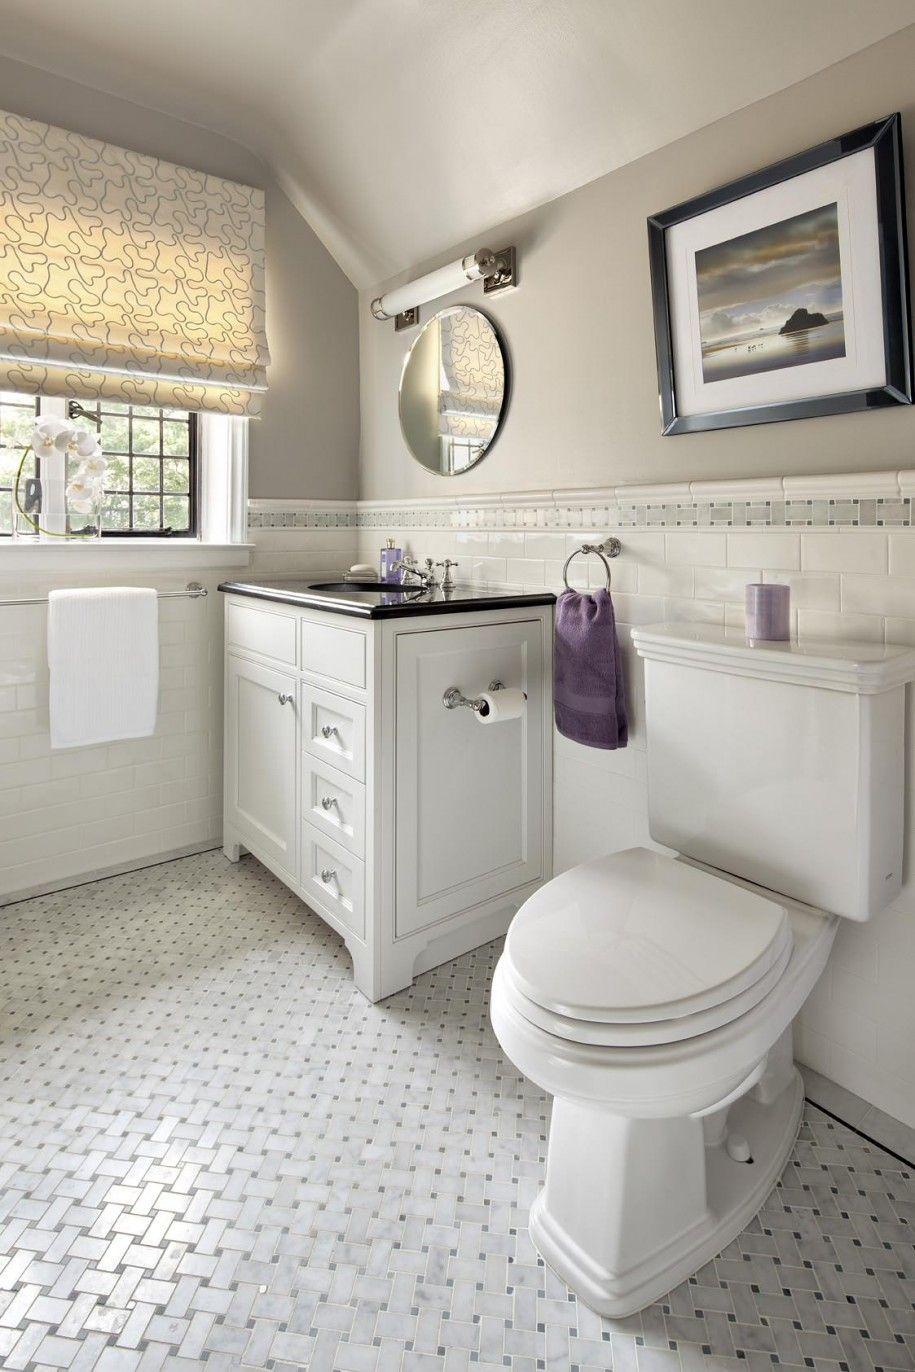 Stunning Basket Weave Tile For Classic Bathroom Design: Cool ...